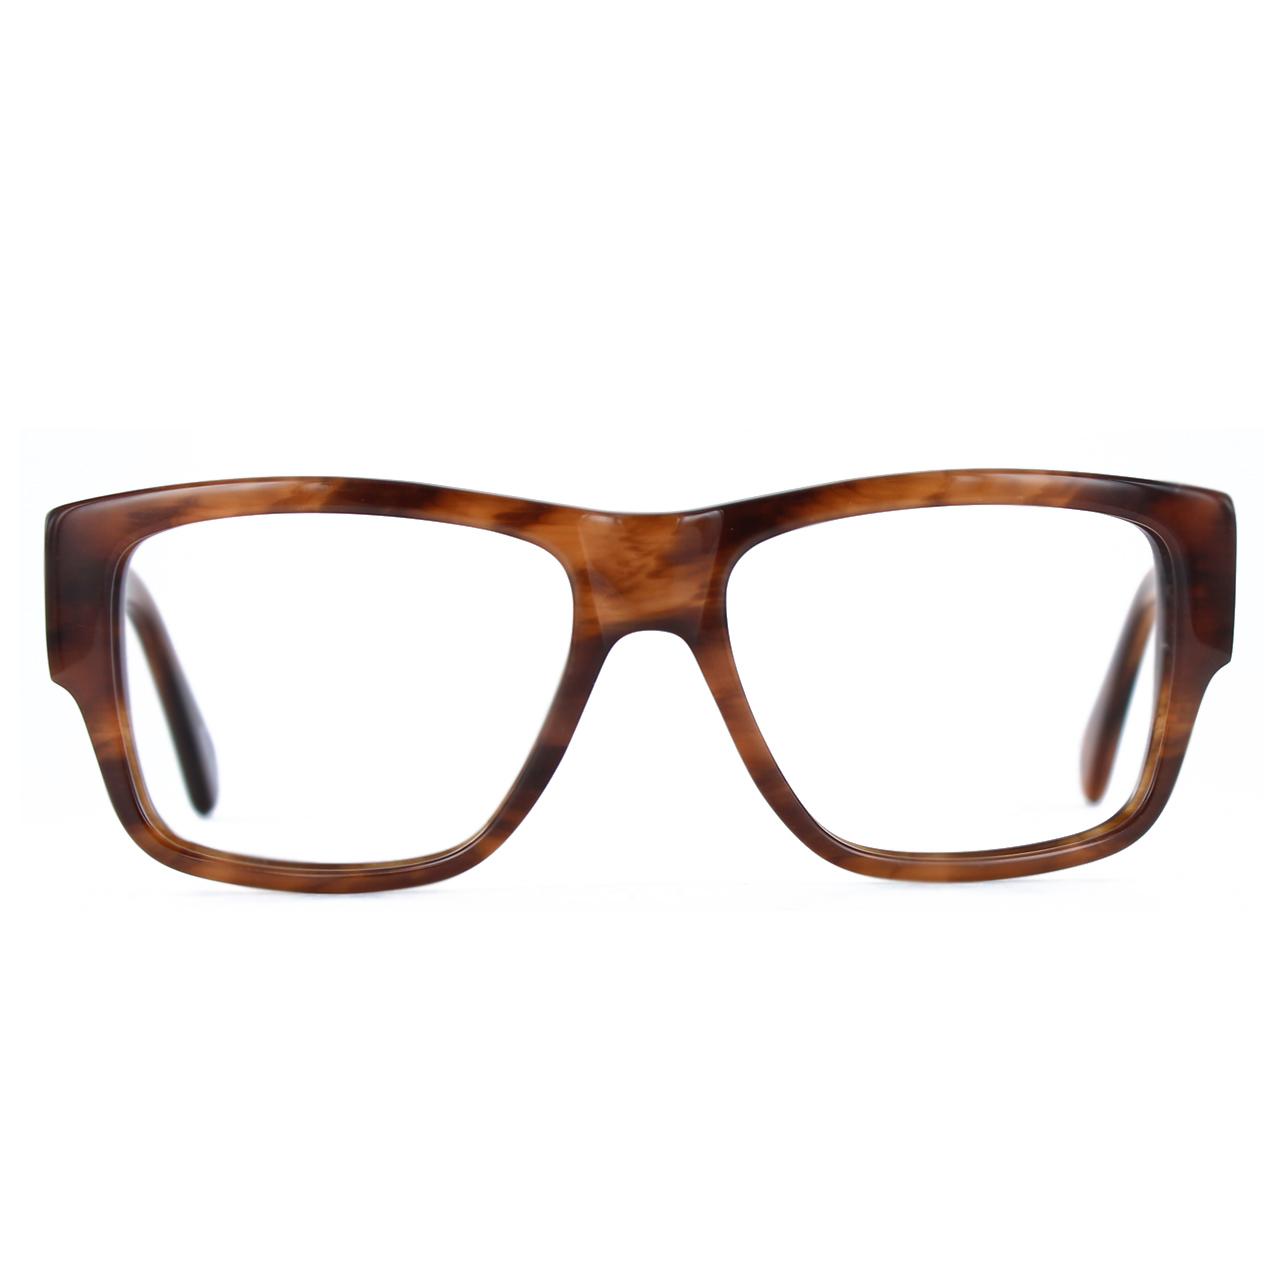 GEEK EYEWEAR® Rx Eyeglasses | Ready-To-Wear Specs for Music, Film ...